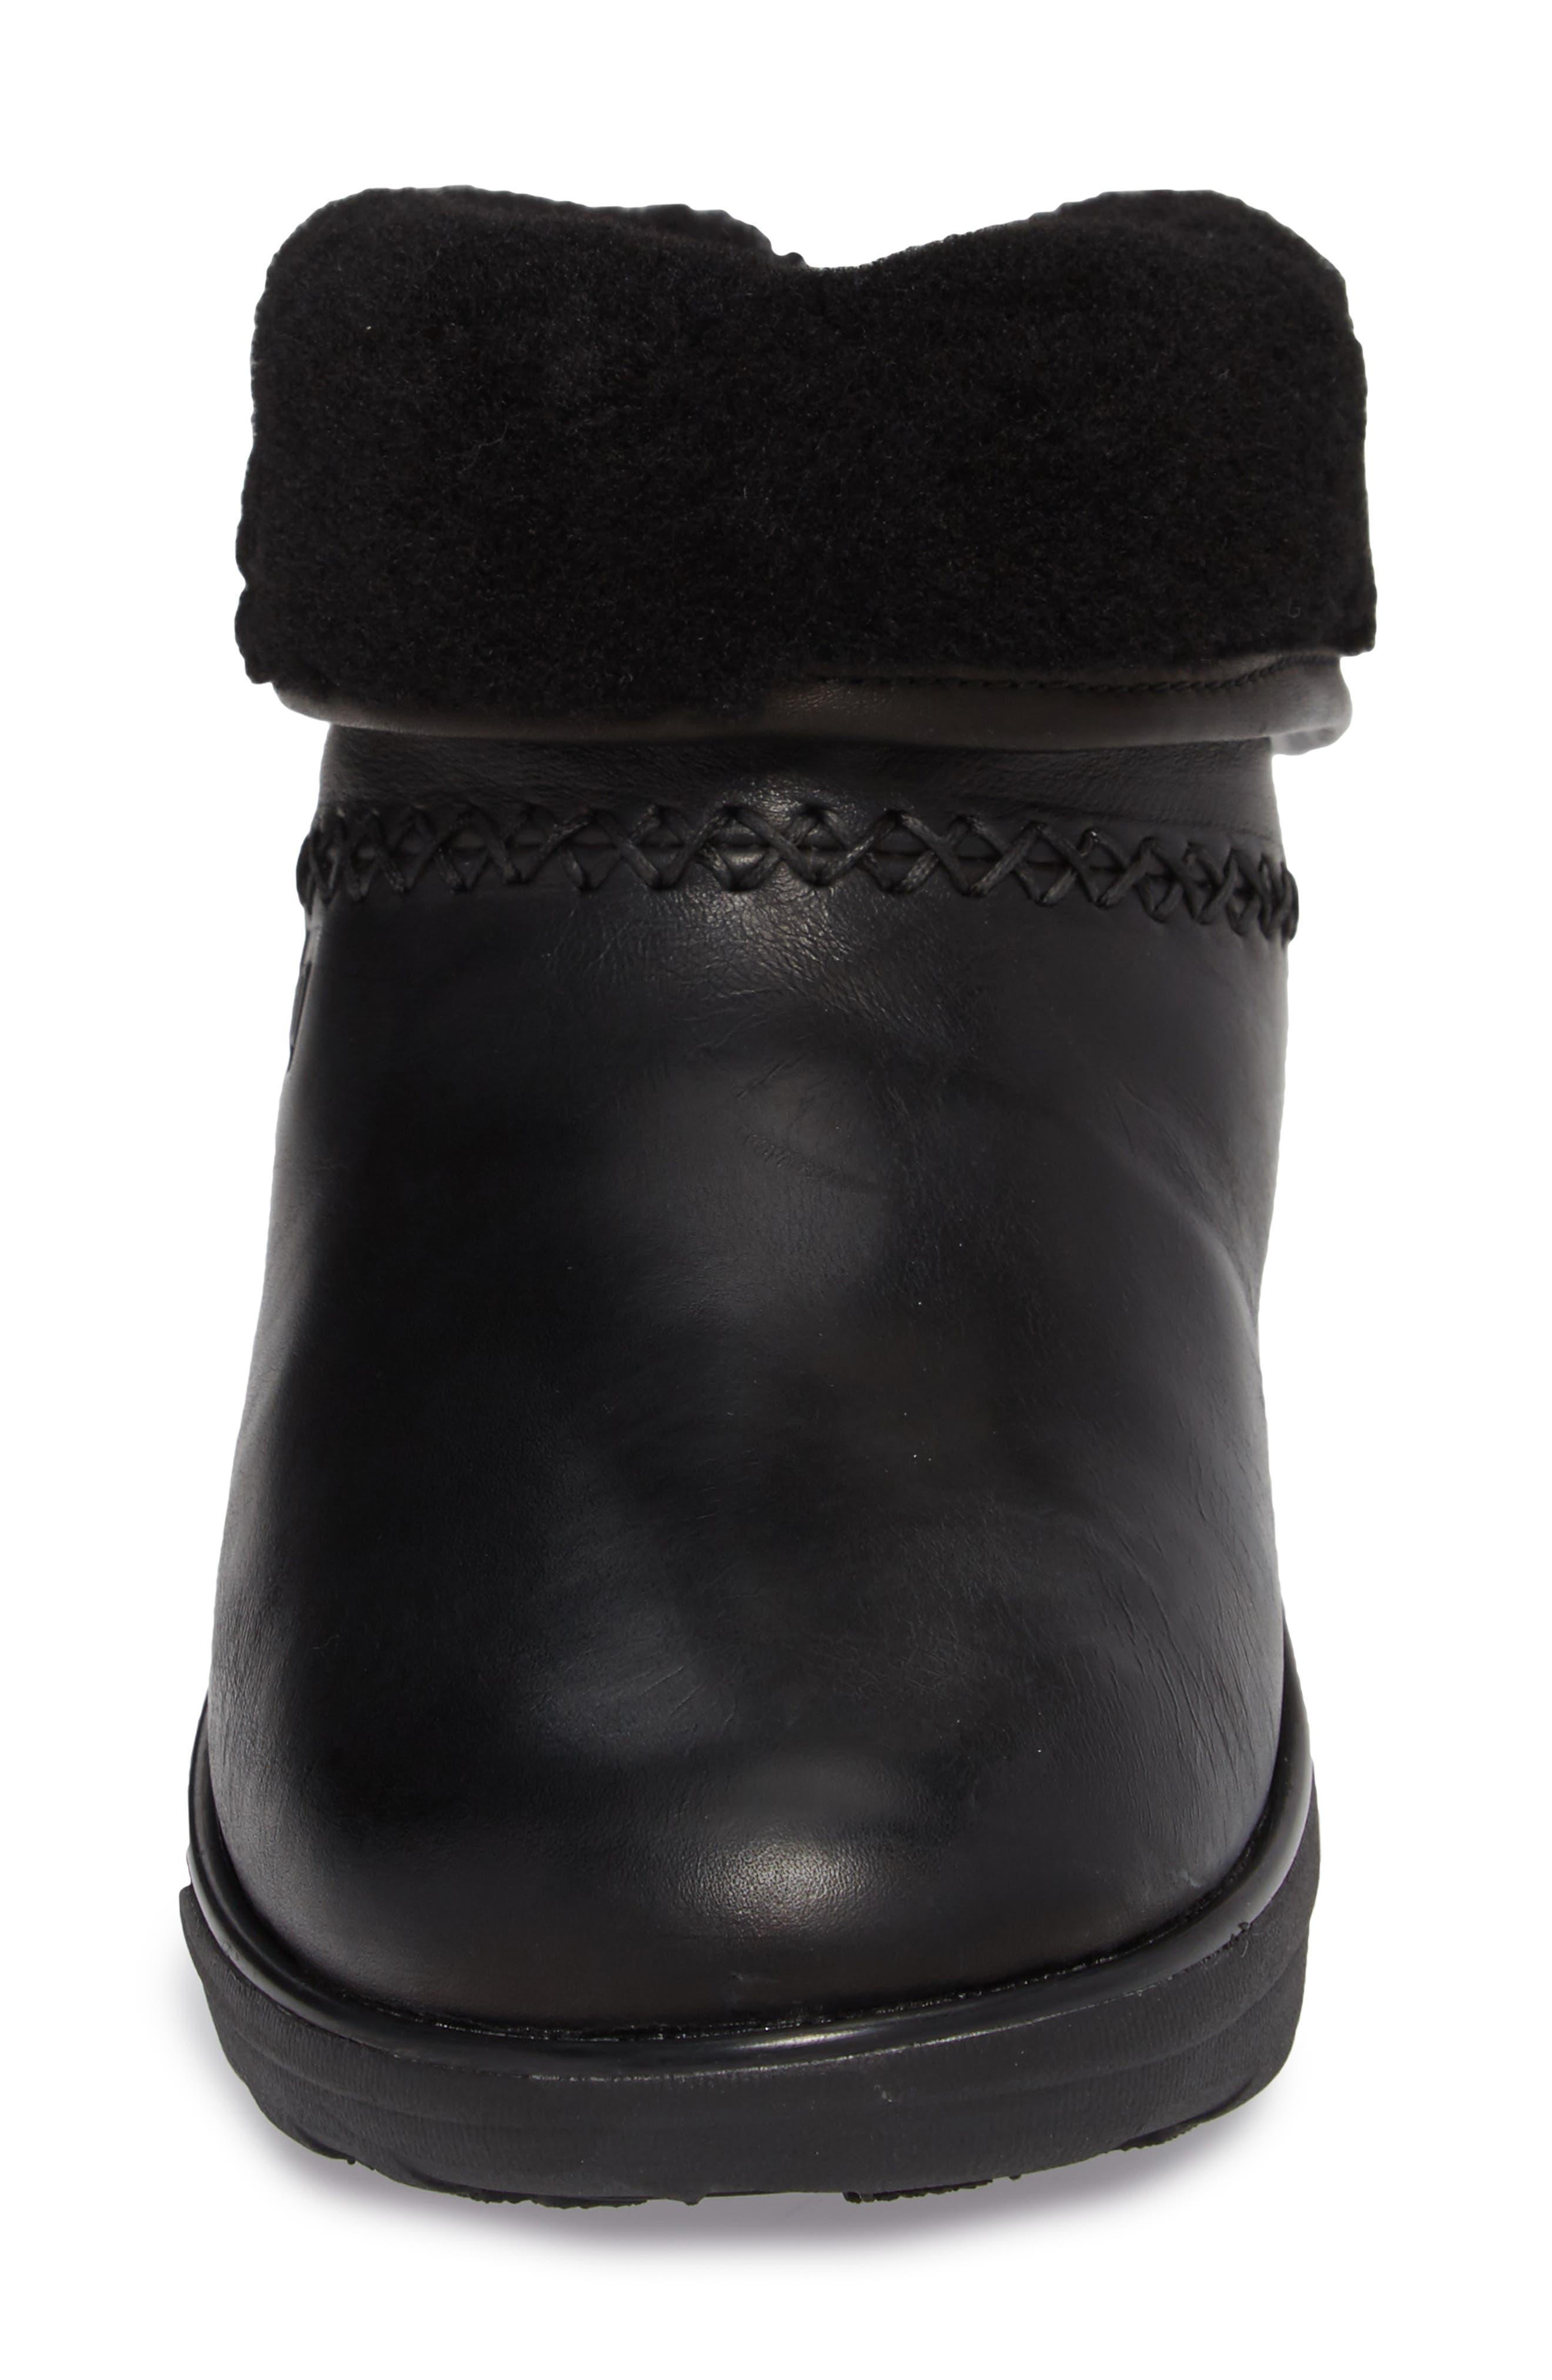 Mukluk Shorty II Boot,                             Alternate thumbnail 4, color,                             Black Leather